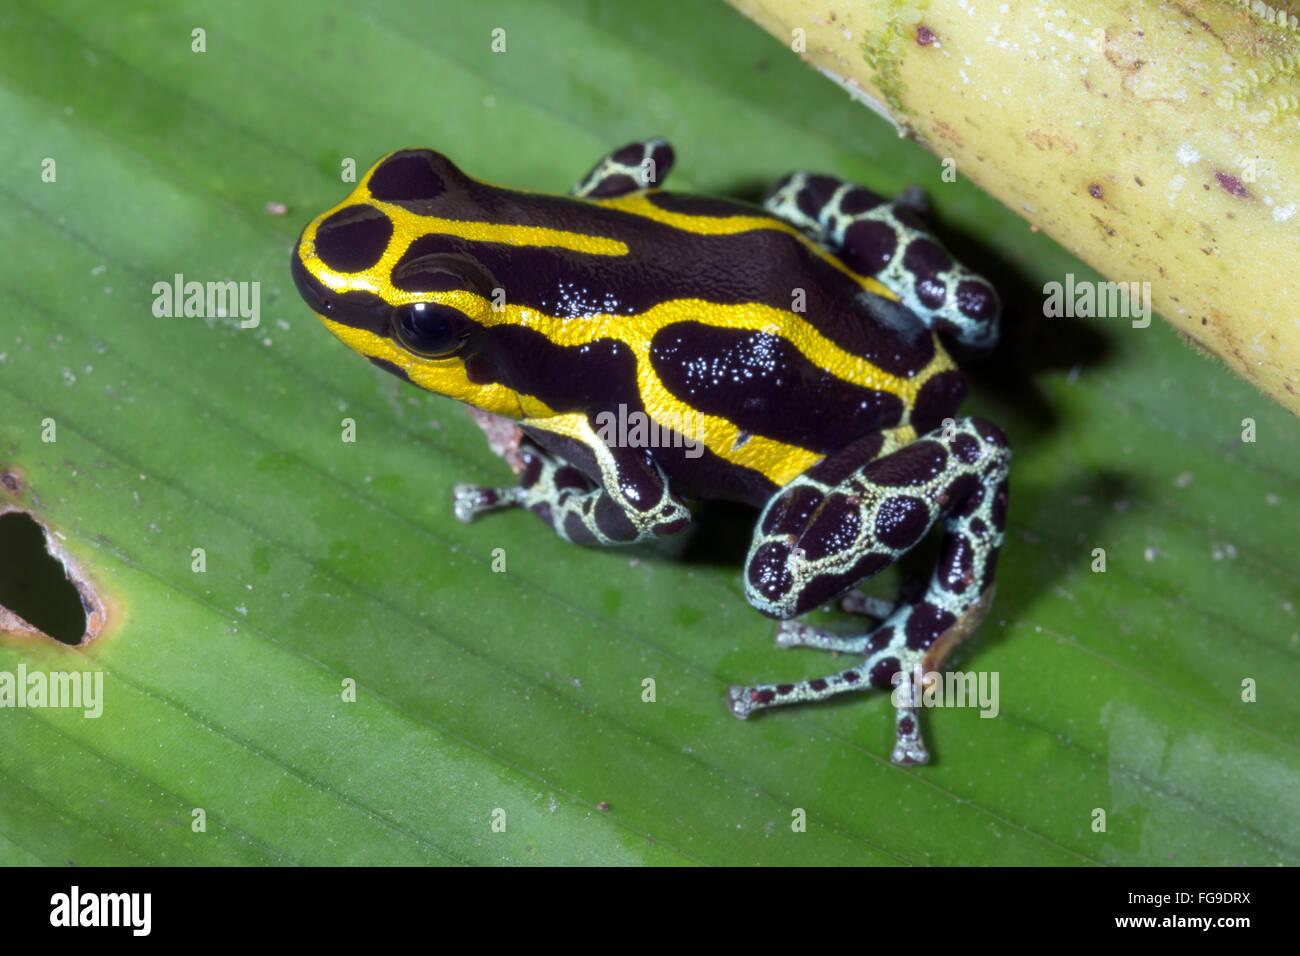 Variabile Rana veleno (Ranitomeya coenobita), Ecuador Immagini Stock